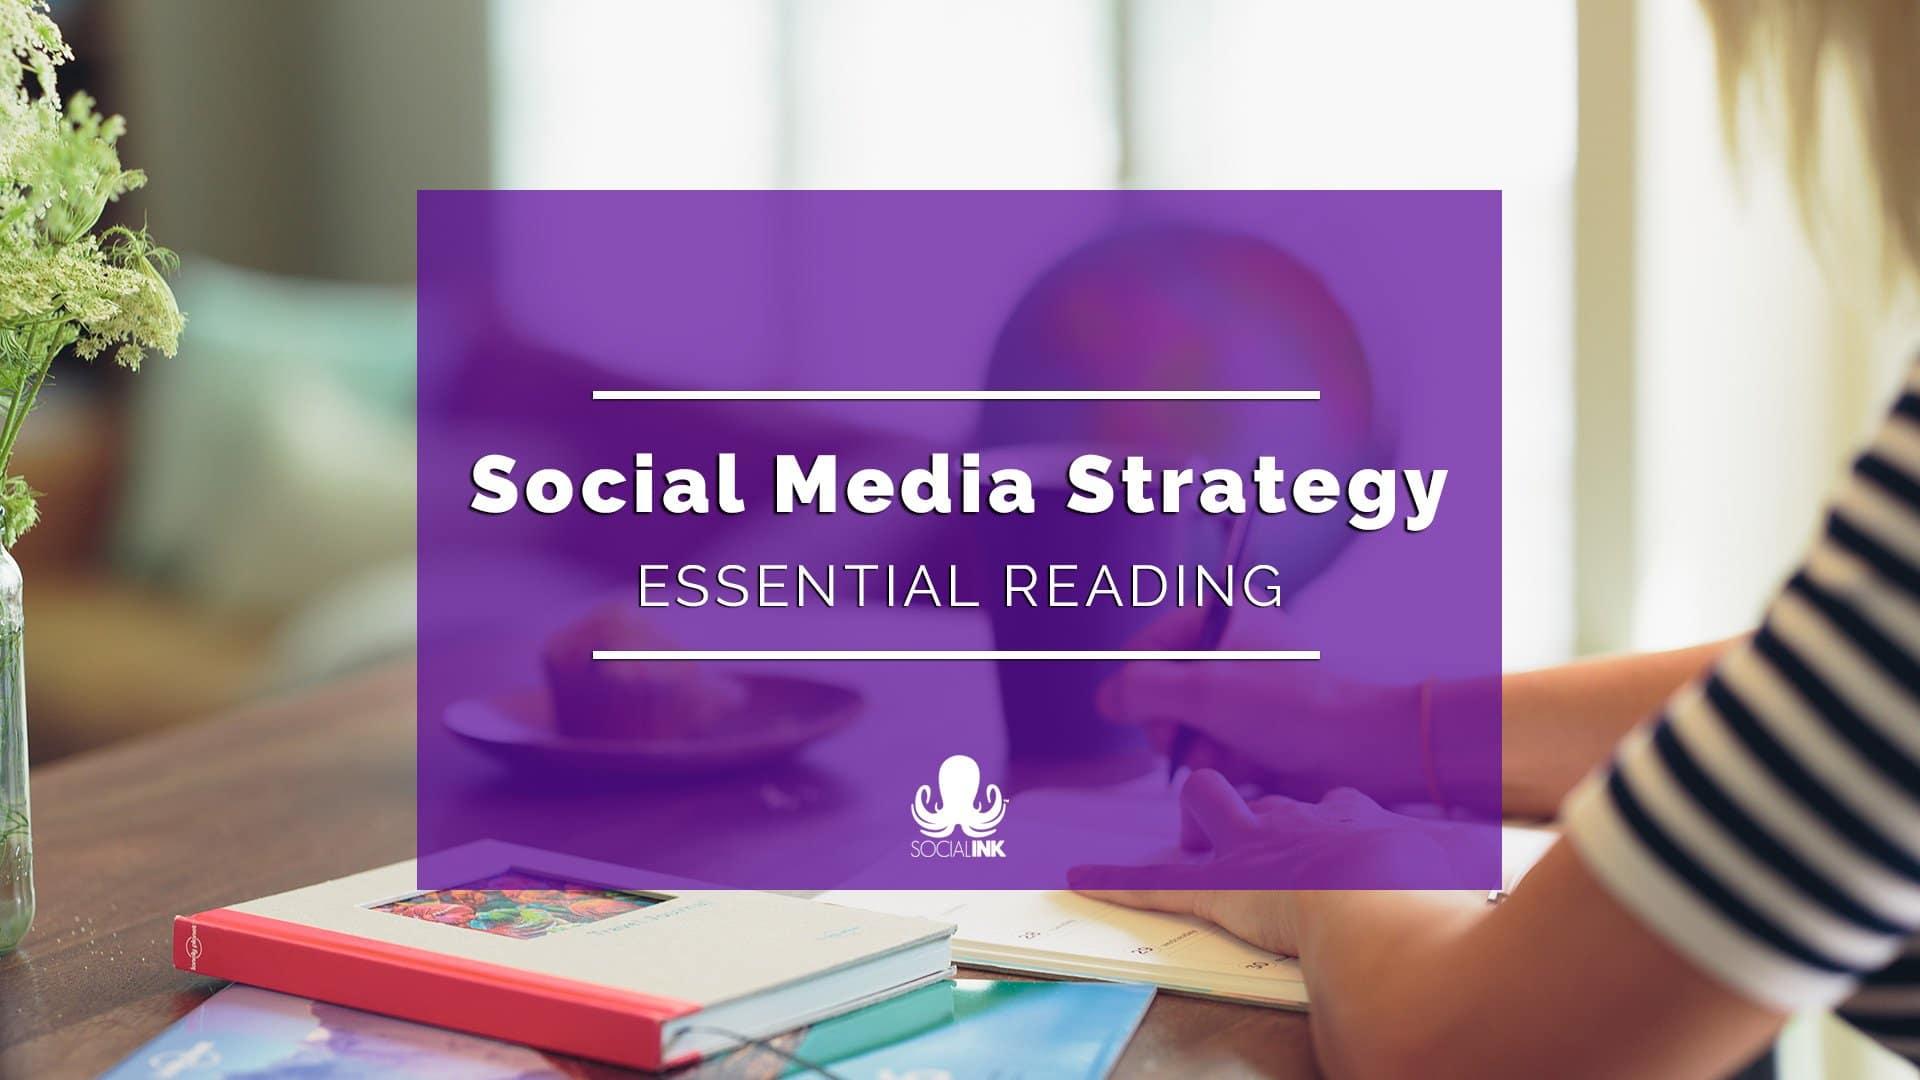 Social Media Strategy: Essential Reading